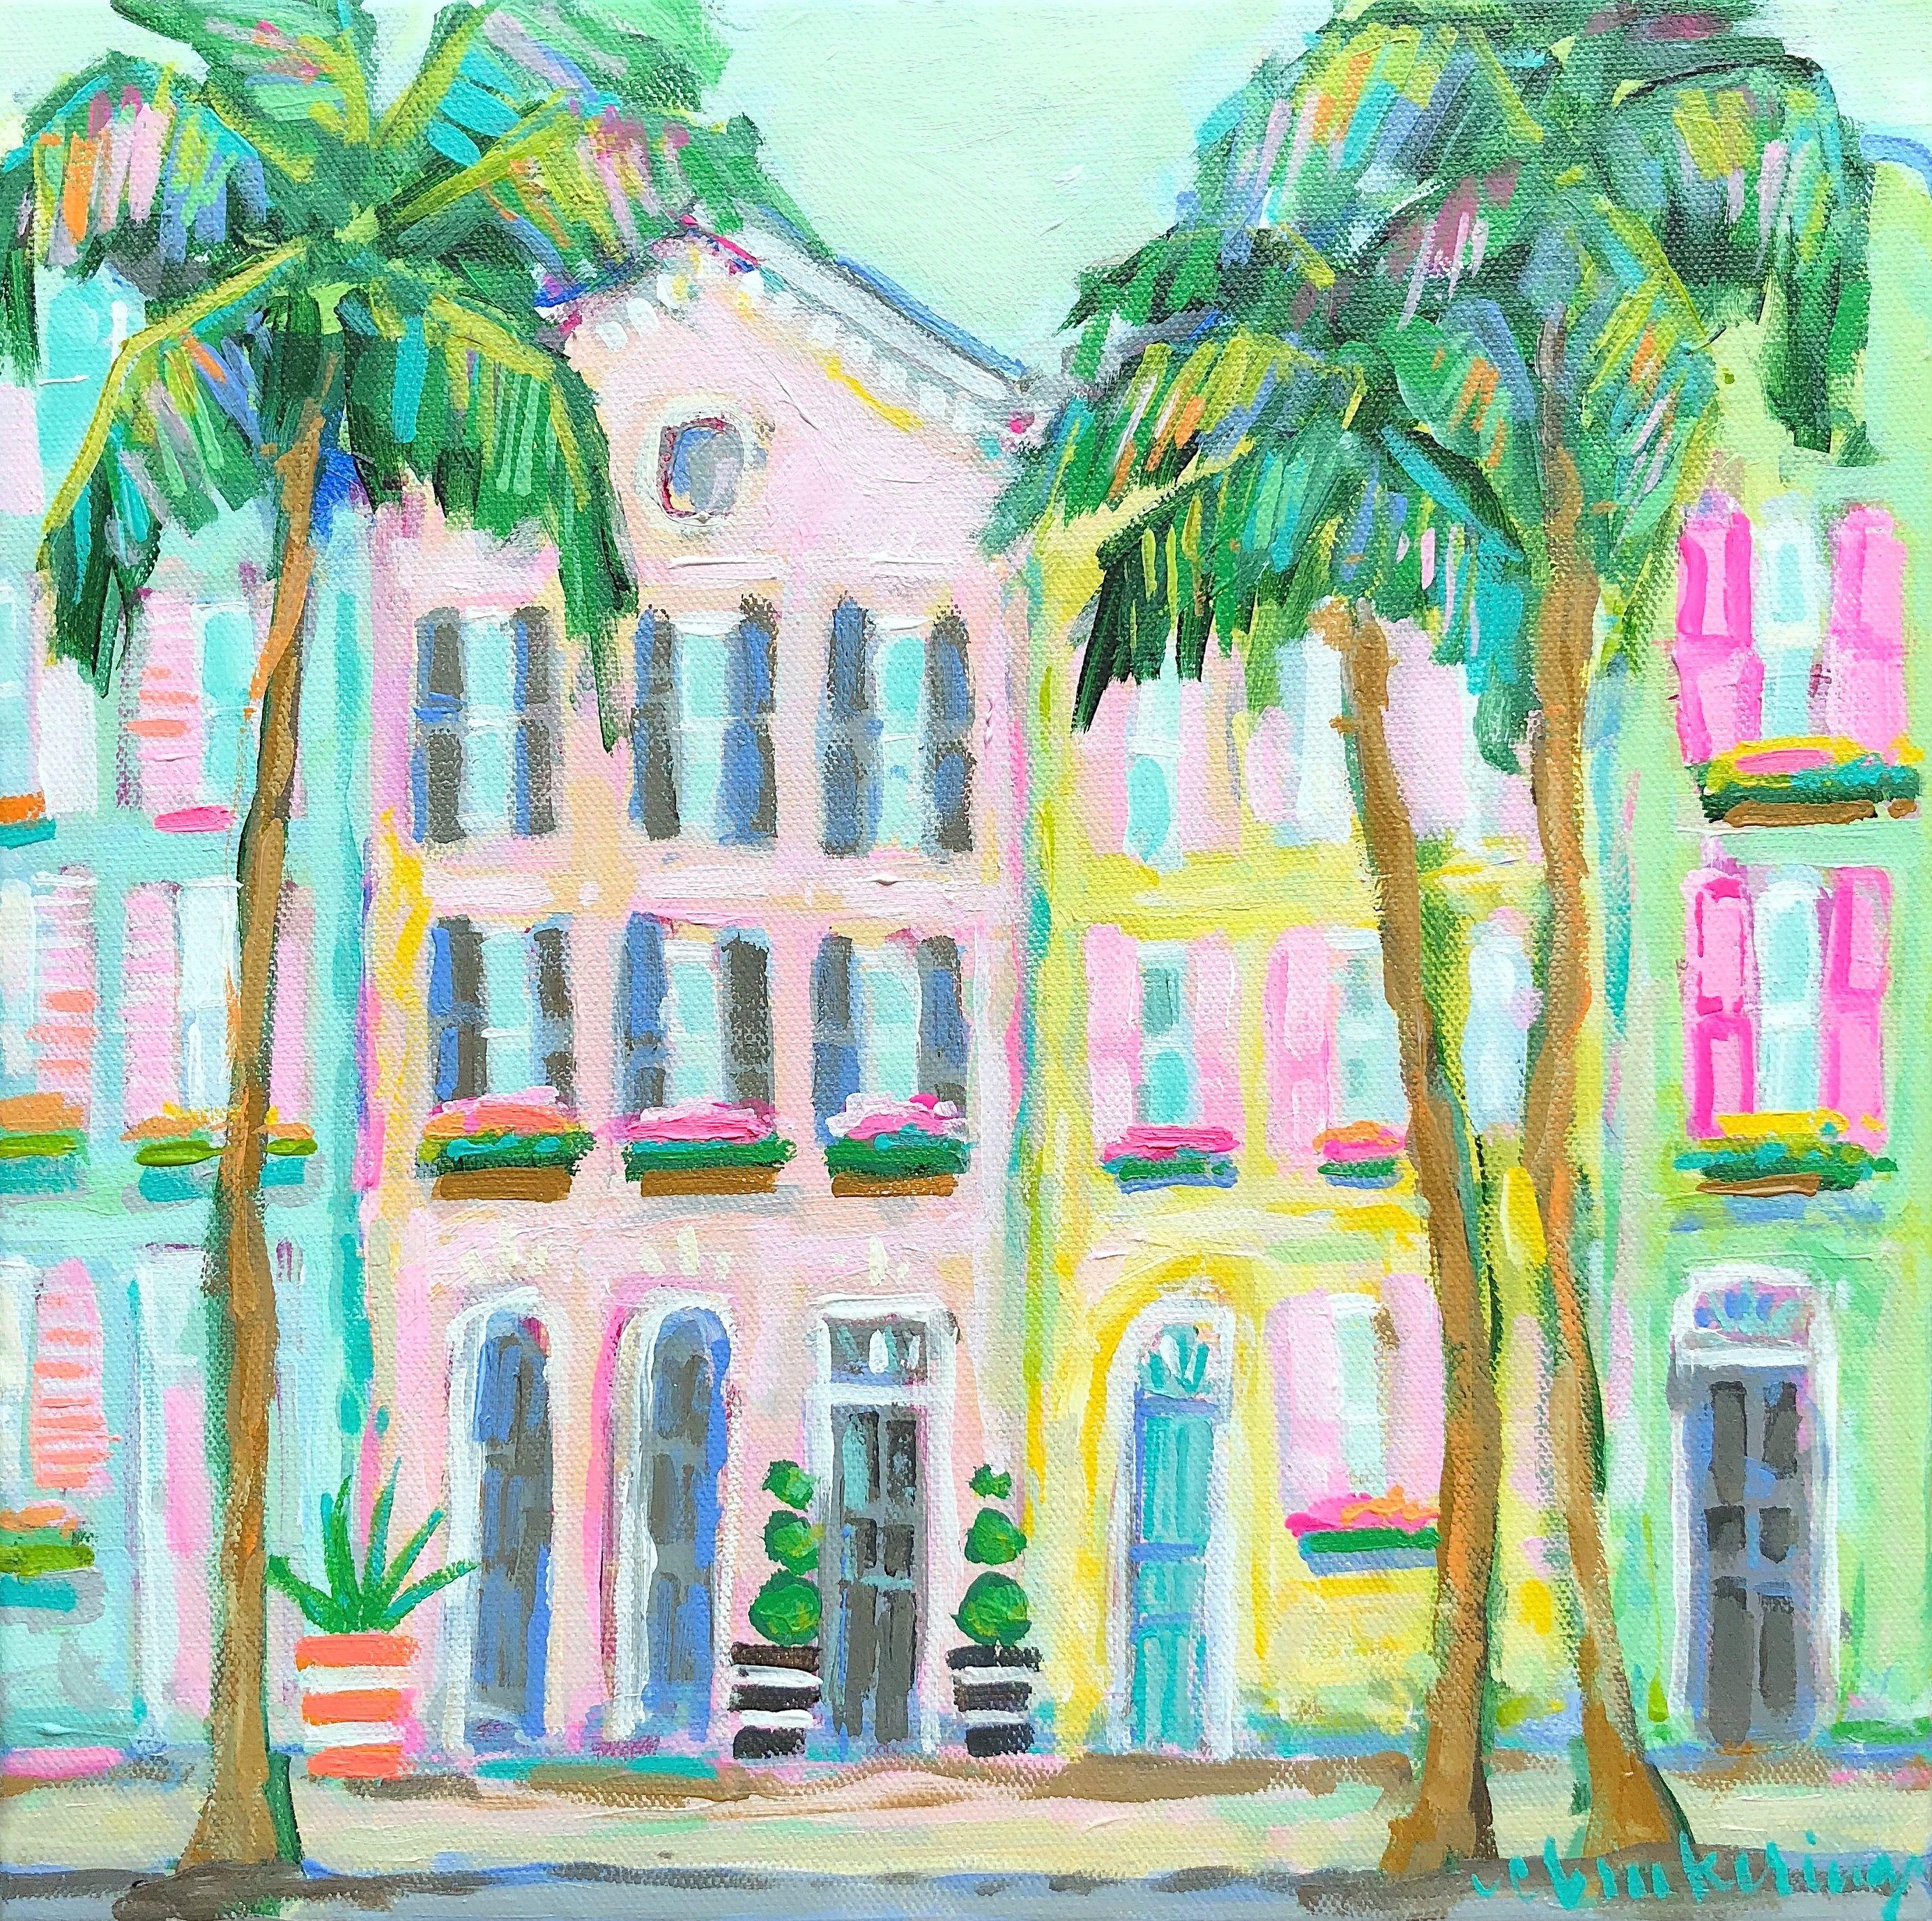 c5d8b00ad02d6f Charleston painting - rainbow row painting - rainbow row art - colorful  building - abstract building painting - Charleston artist - artwork for  guest ...